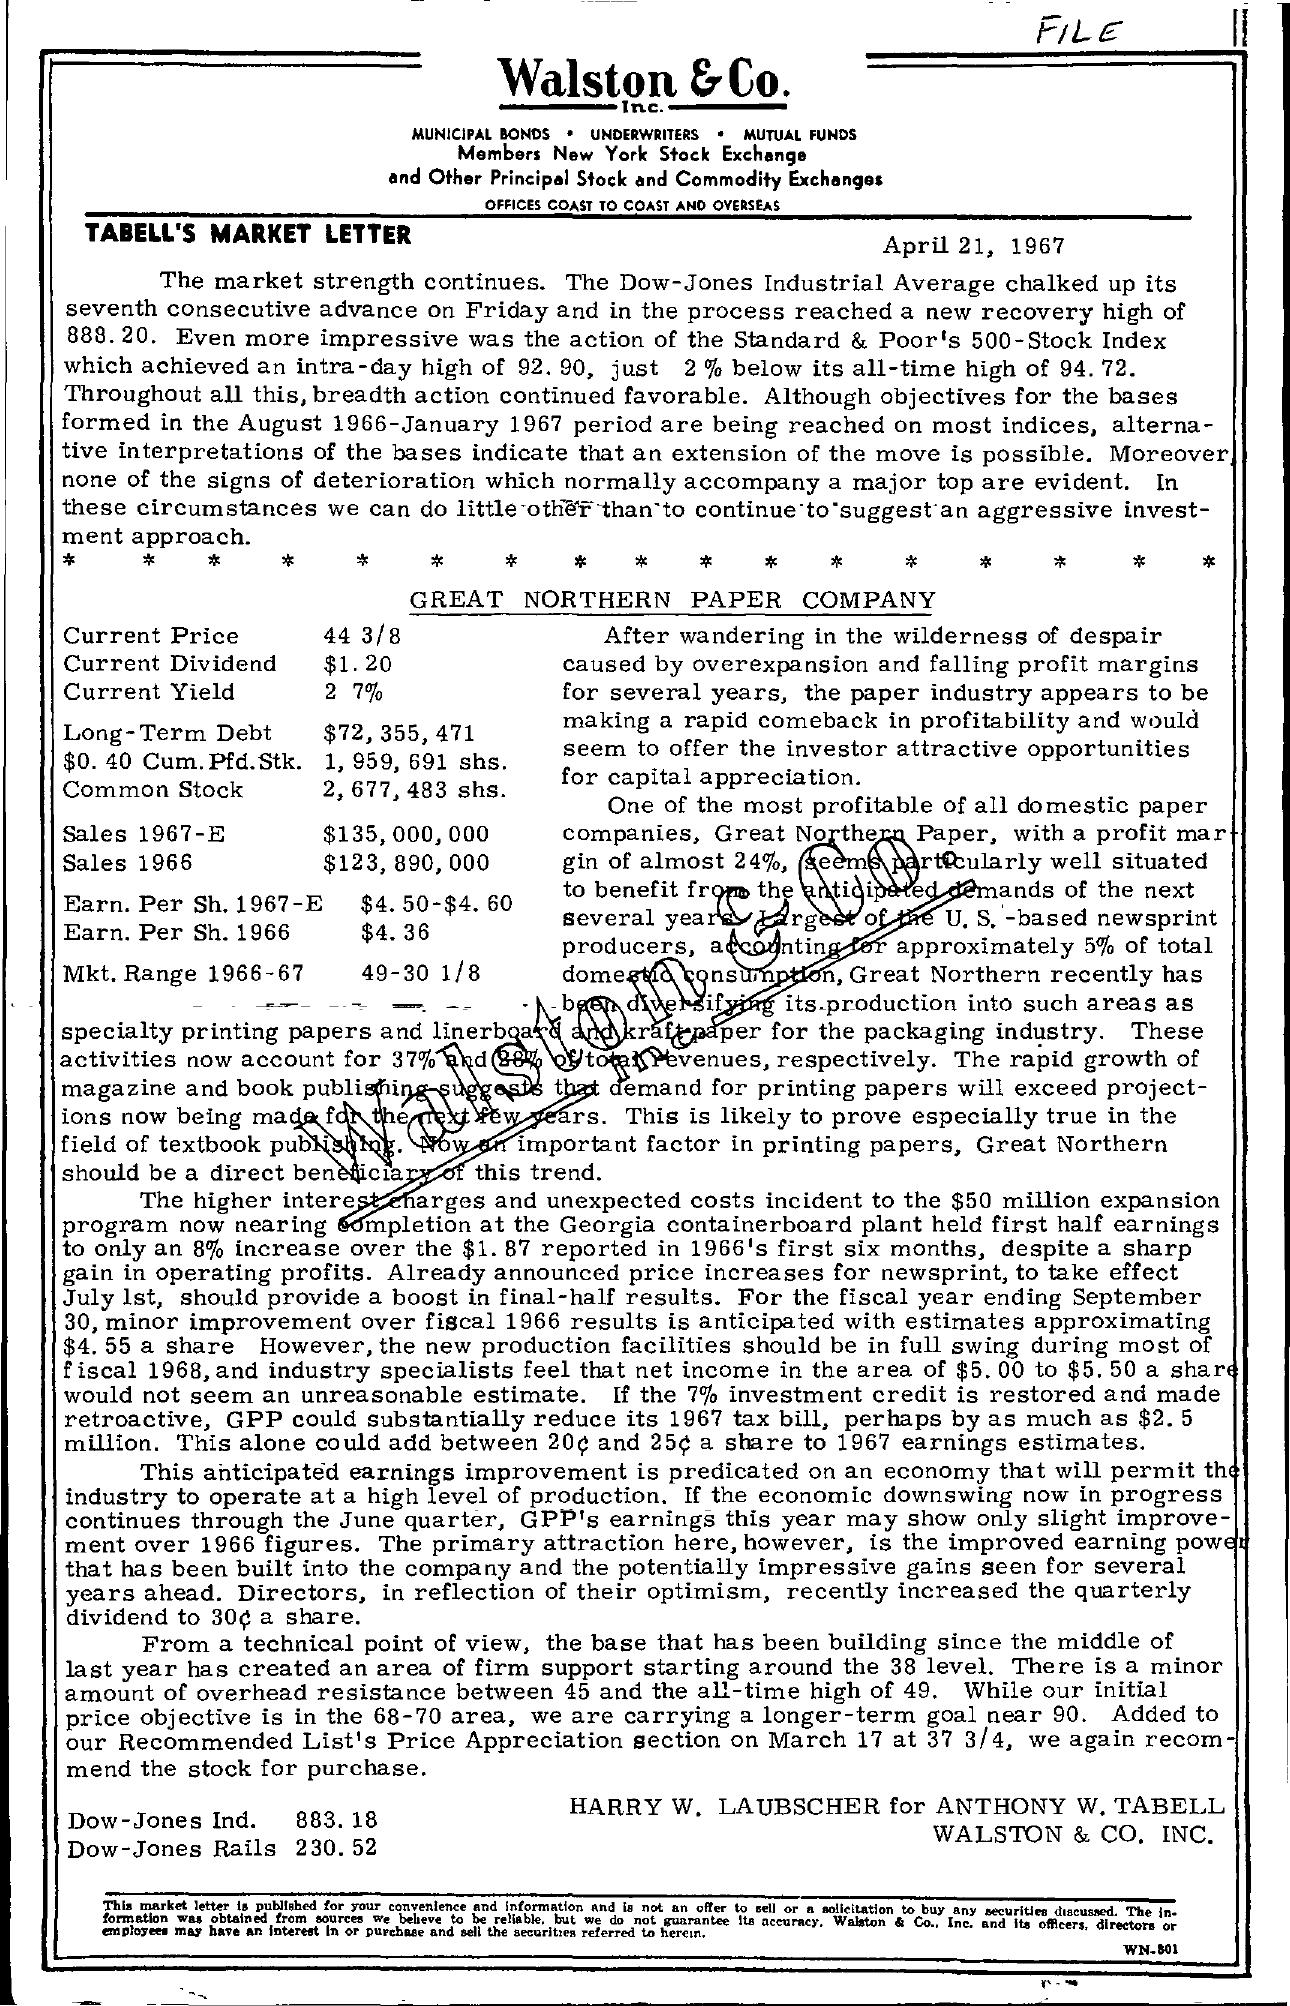 Tabell's Market Letter - April 21, 1967